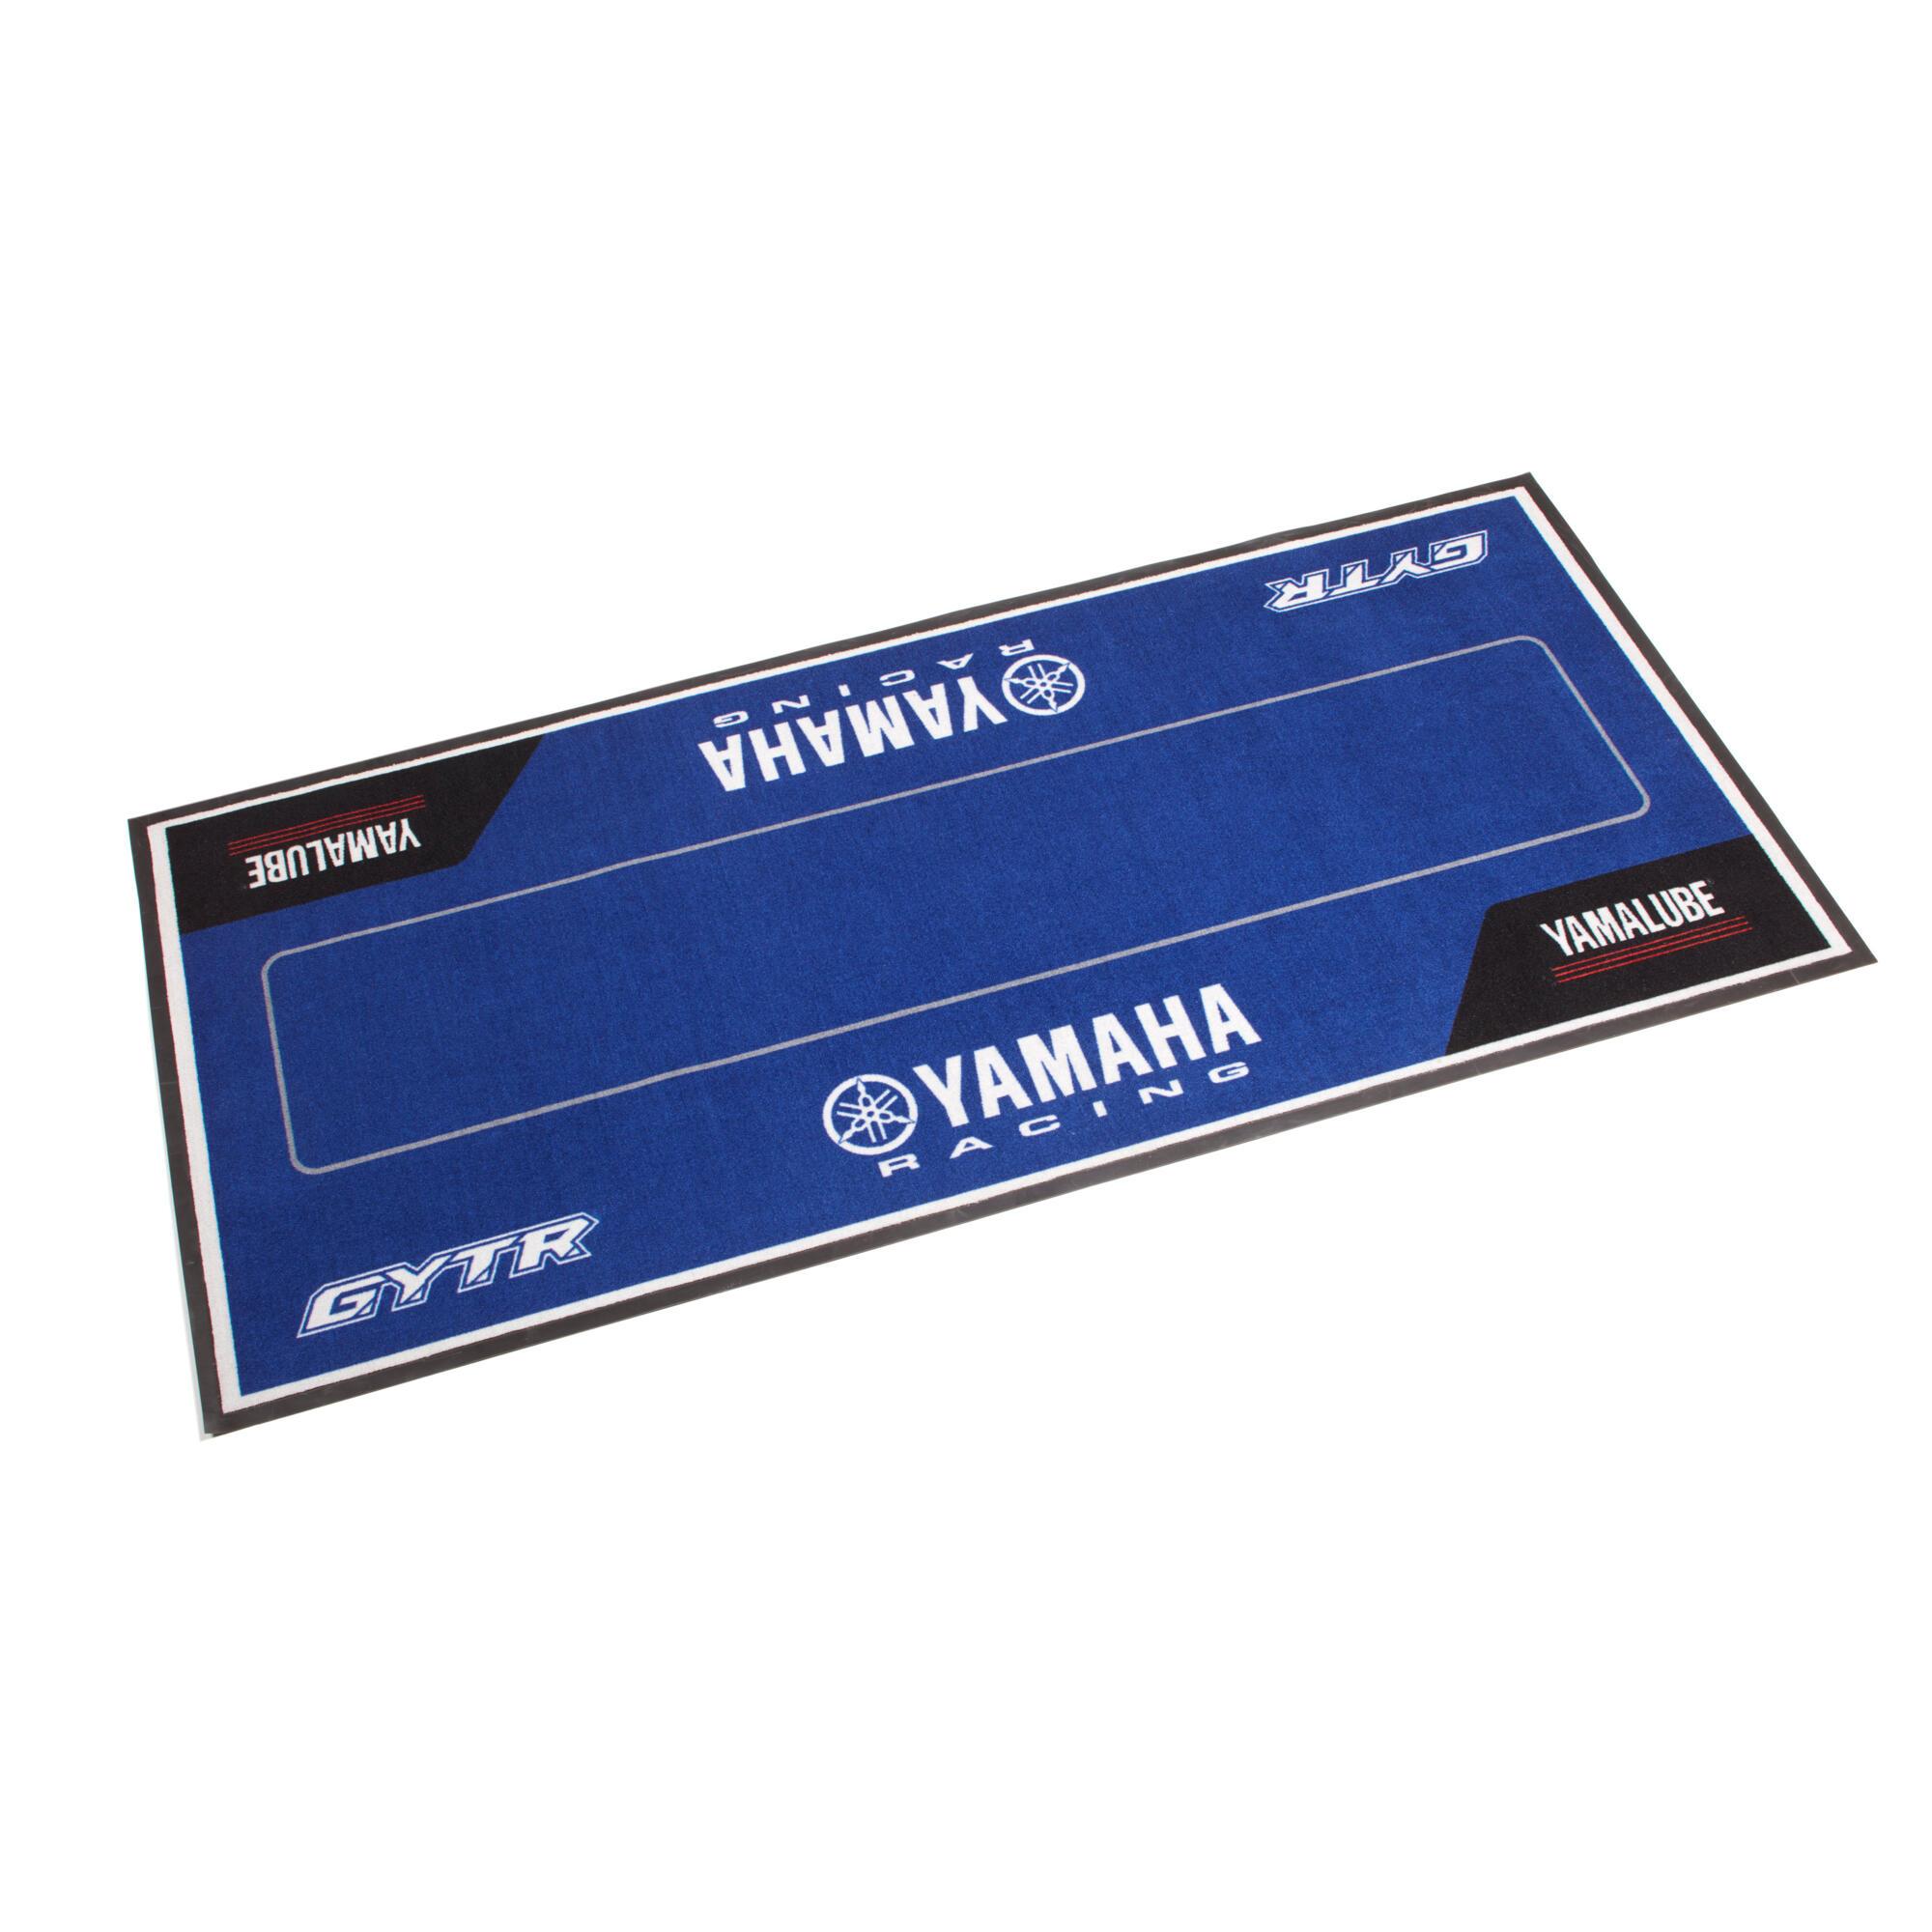 www.yamaha-motor.eu